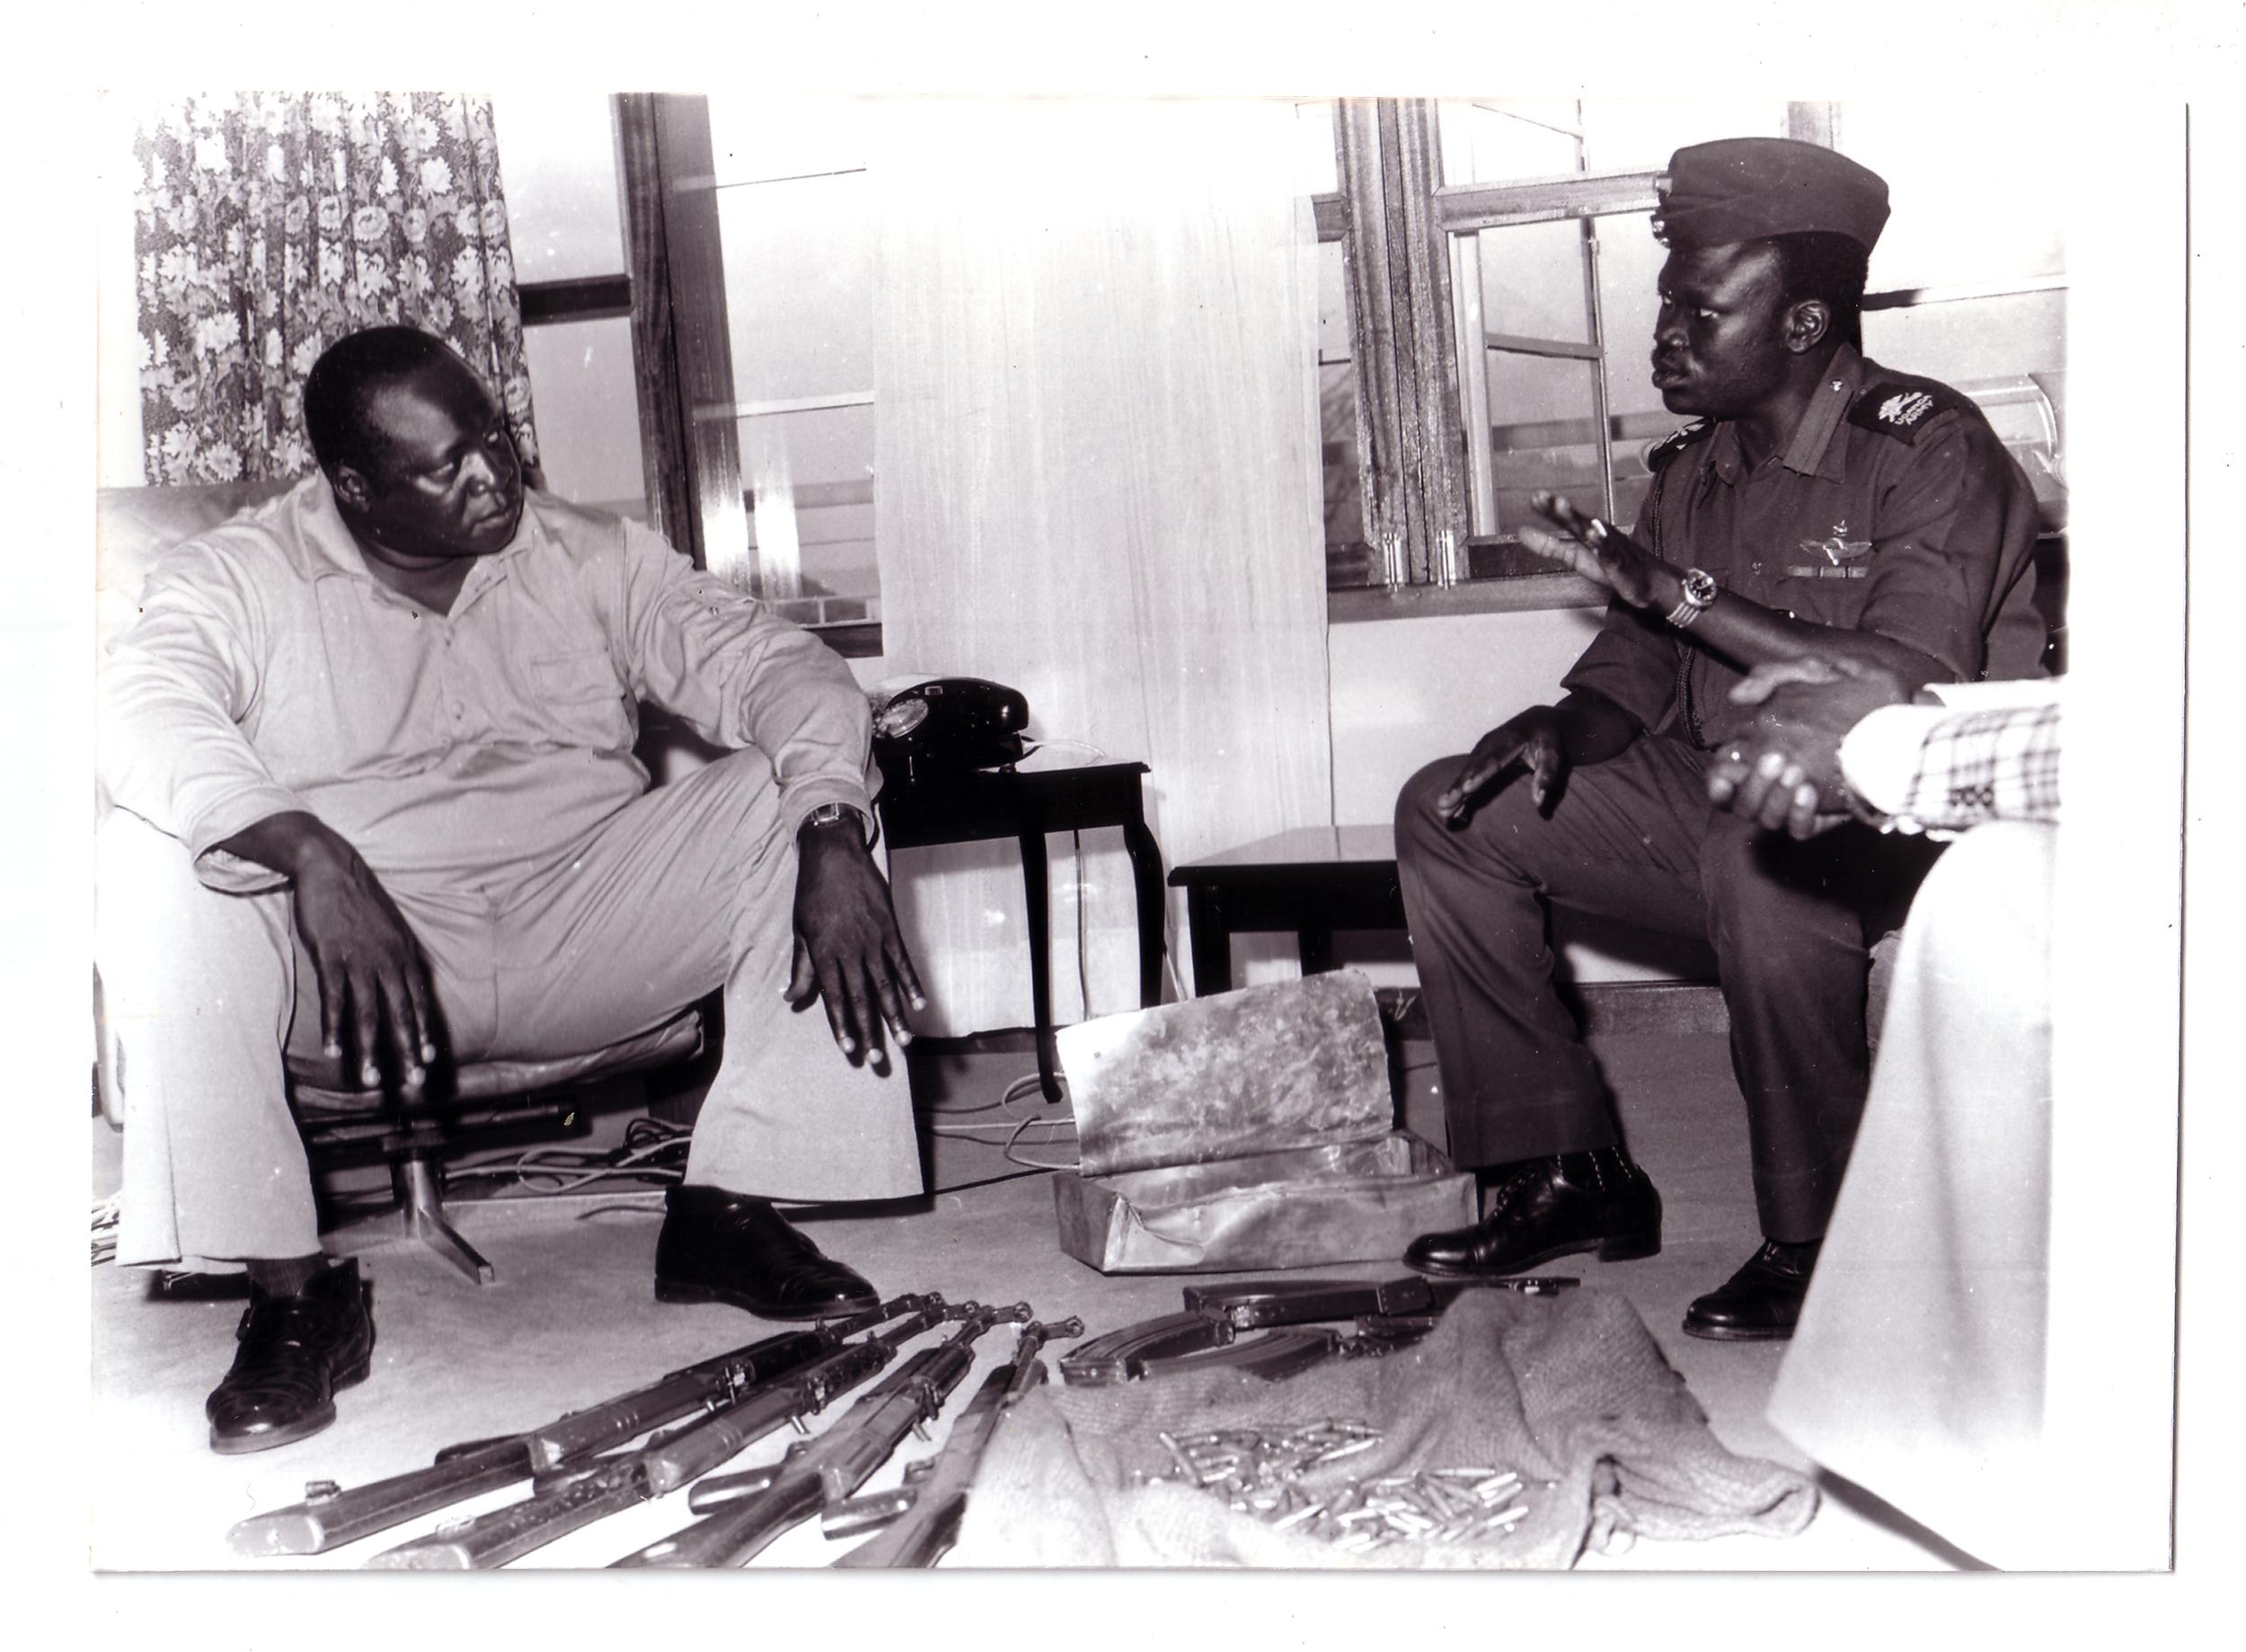 General Idi Amin receives a briefing on subversive activities from his loyal subordinate, Yusuf Gowon. (Radio Uganda)